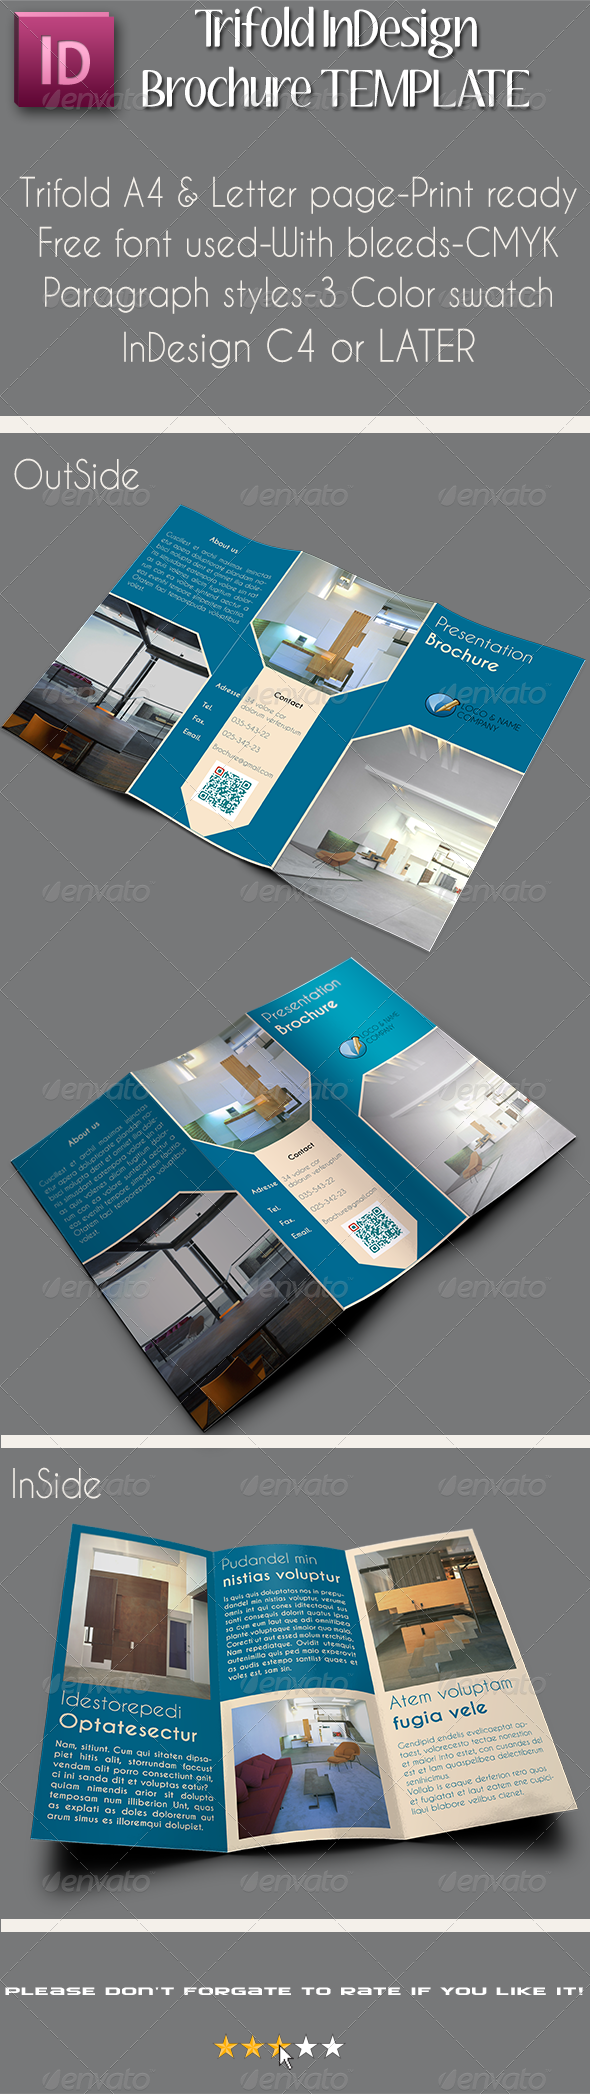 a4 letter trifold brochure template vol 1 graphicriver. Black Bedroom Furniture Sets. Home Design Ideas